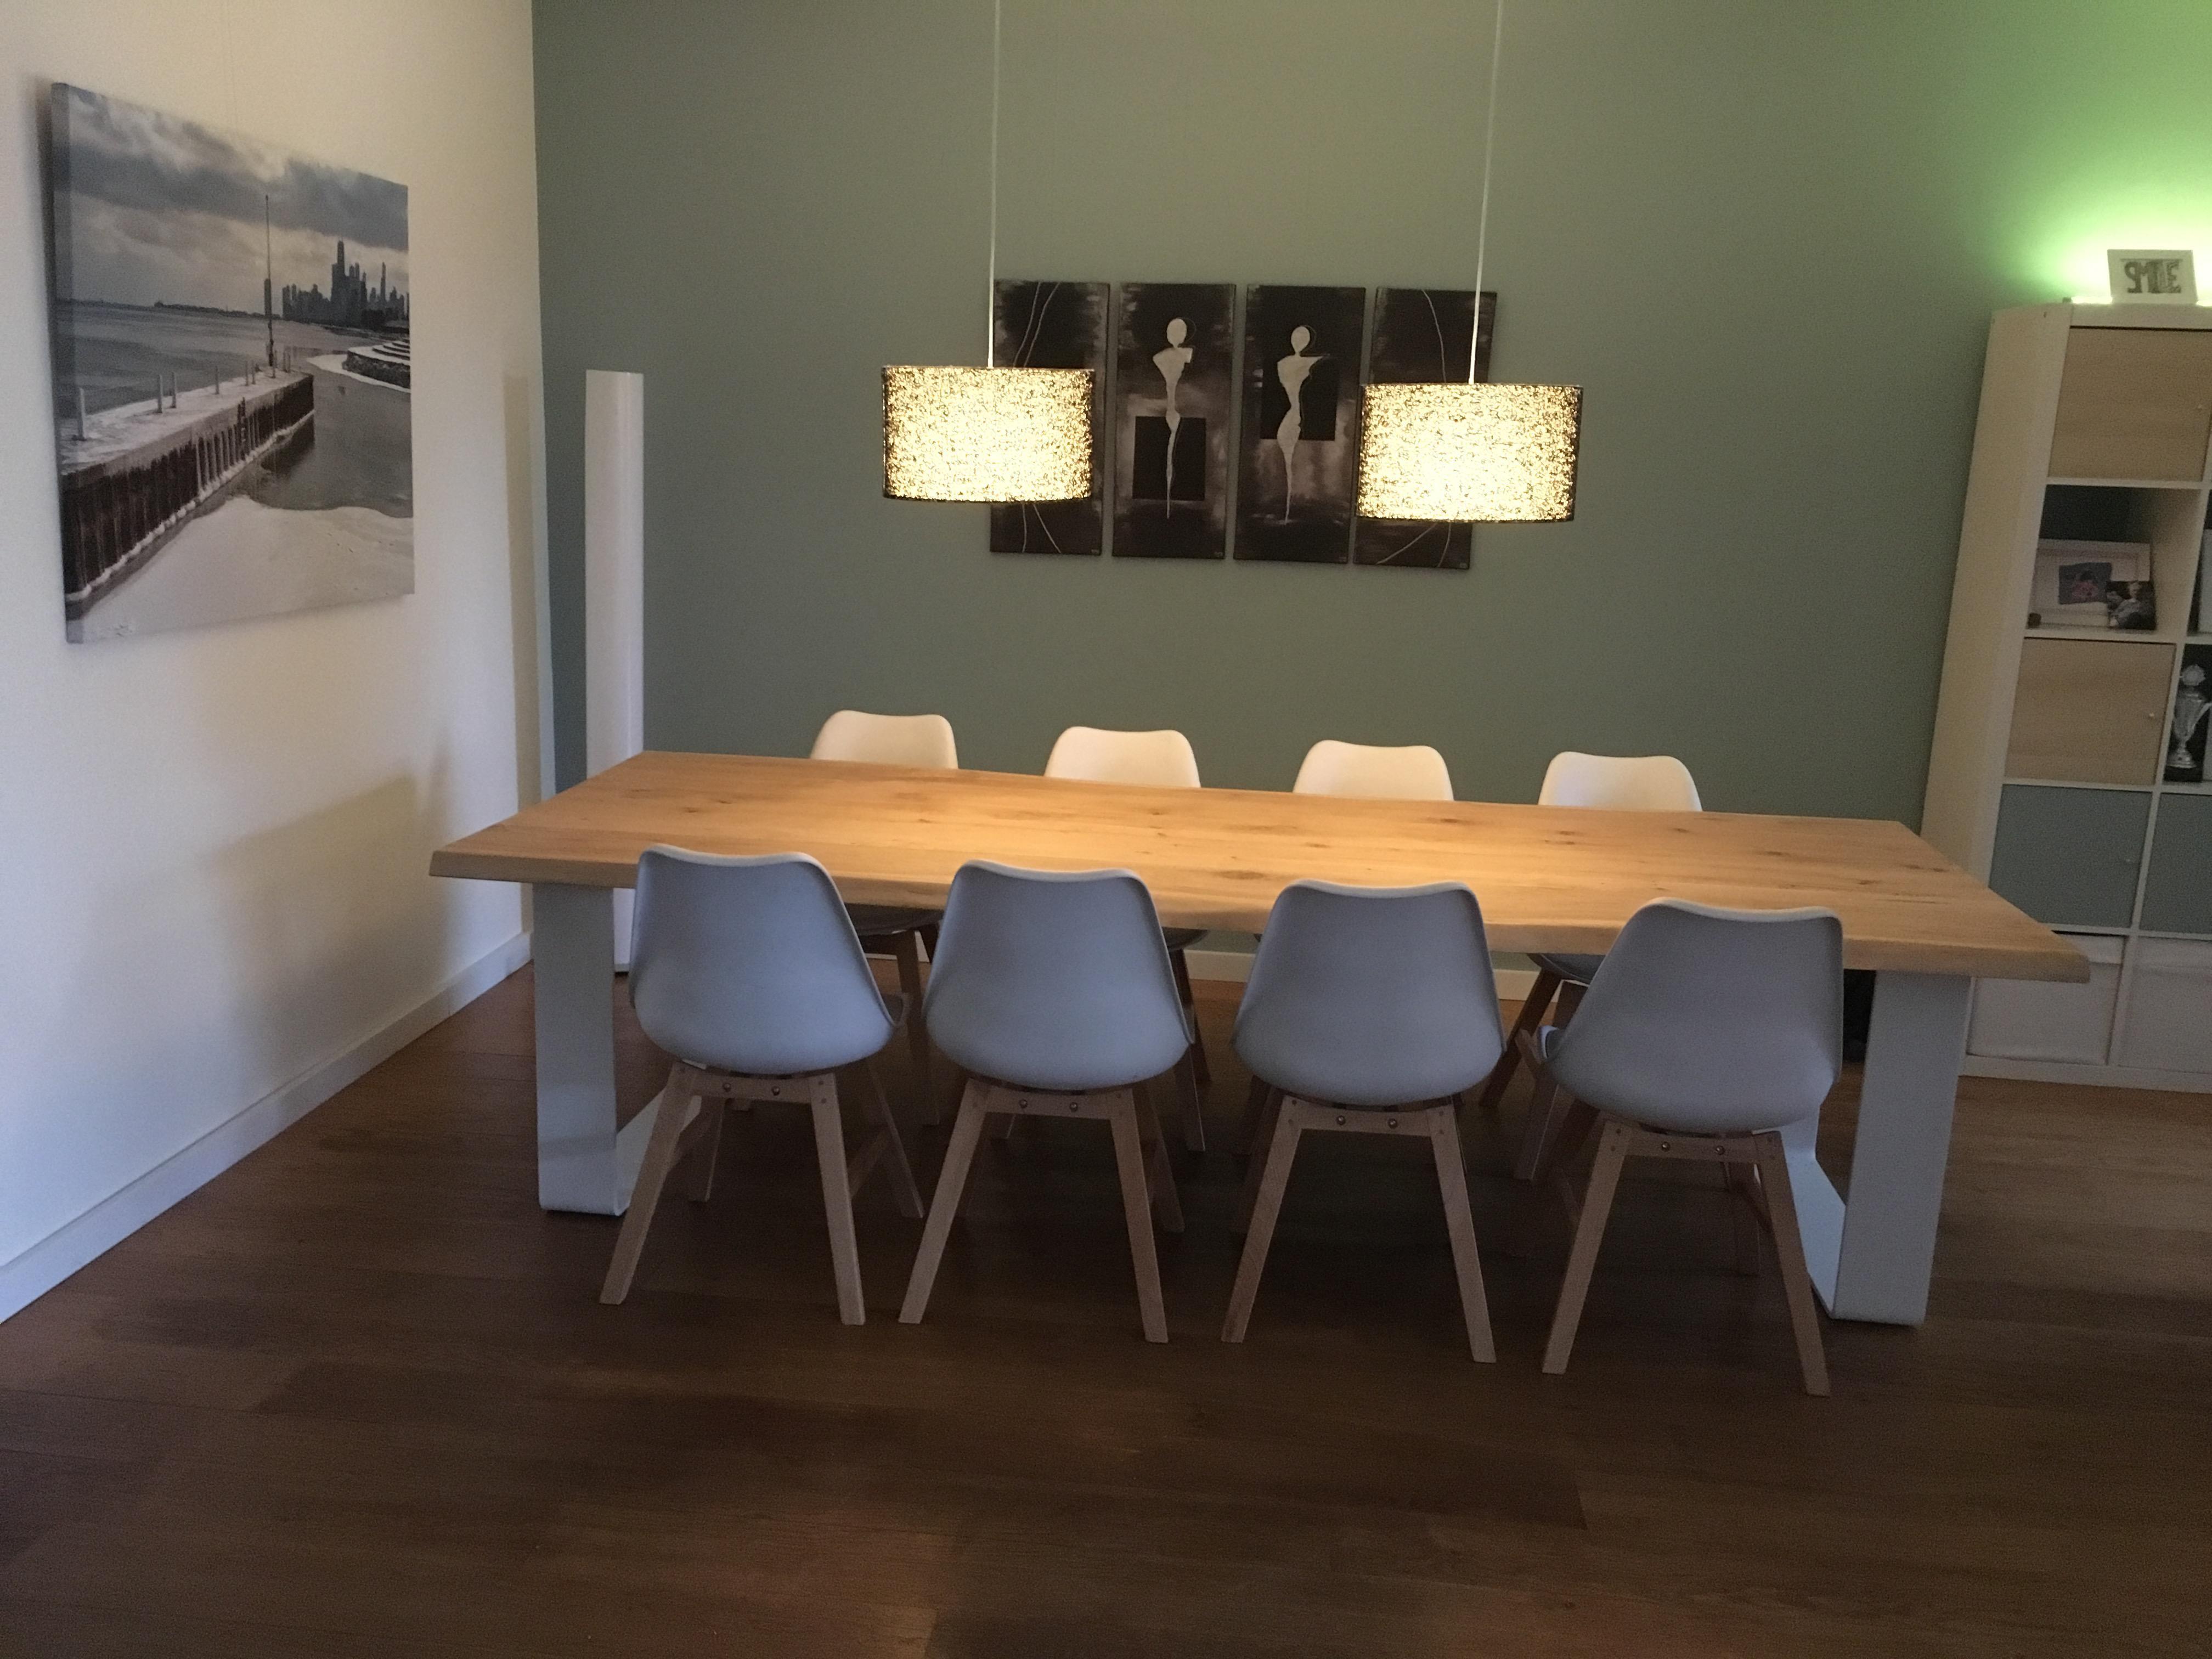 Woonkamer Zonder Salontafel : Woonkamer zonder salontafel perfect stunning antieke houten